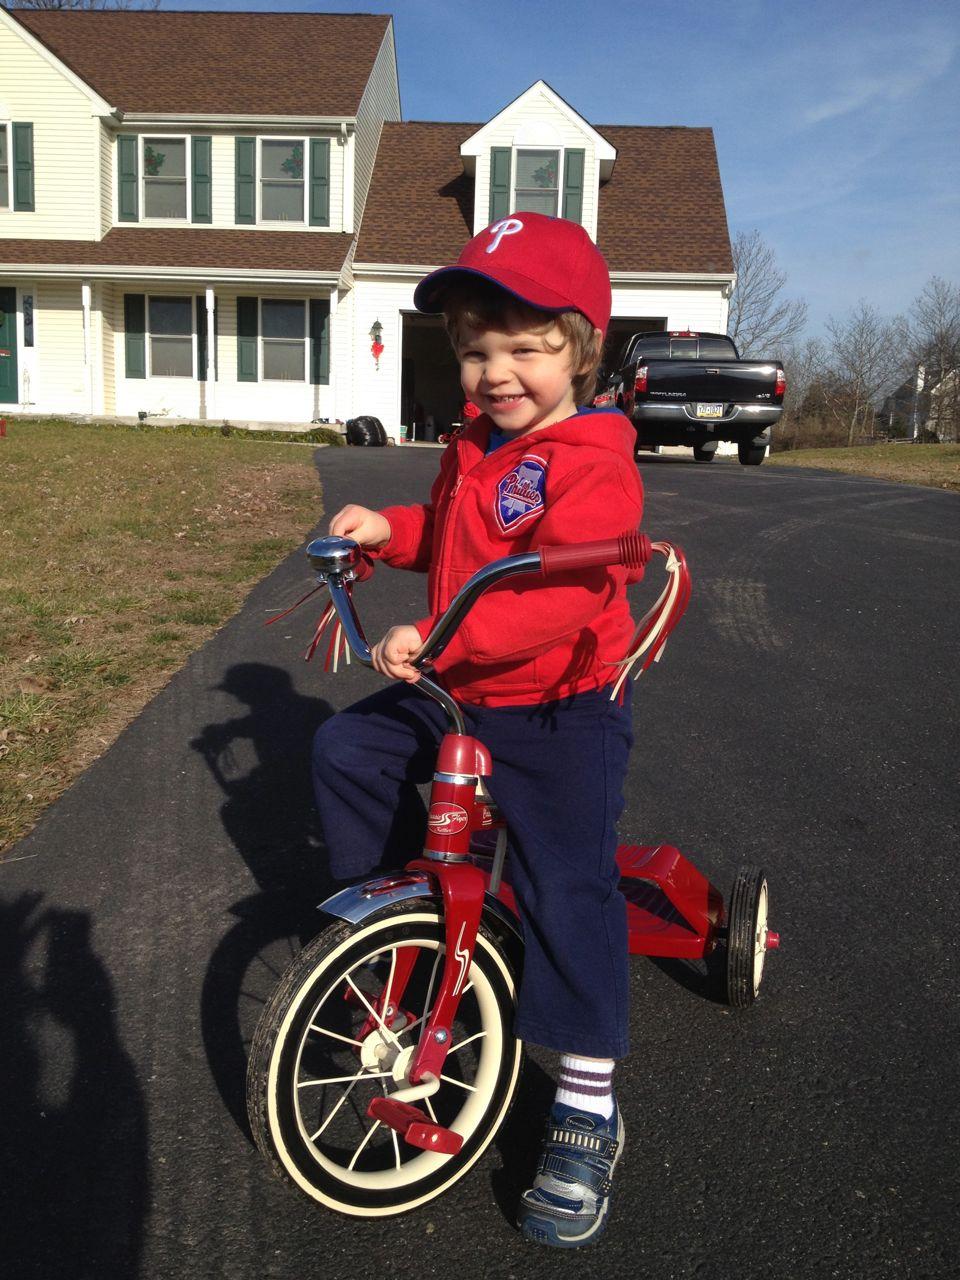 Alex on the bike